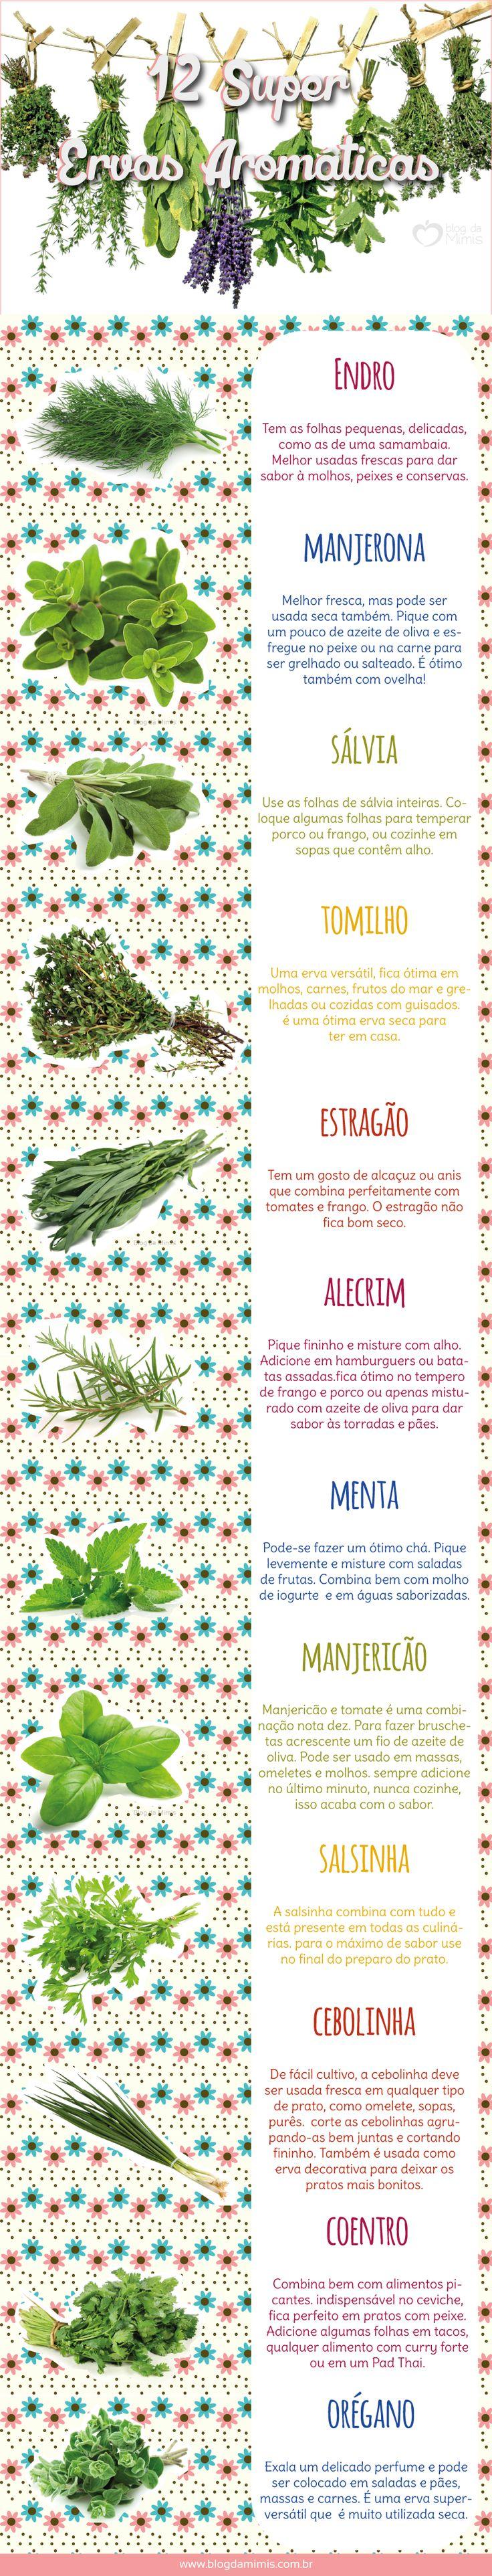 12 Super Ervas Aromáticas - Blog da Mimis - O segredo da boa comida é o tempero…